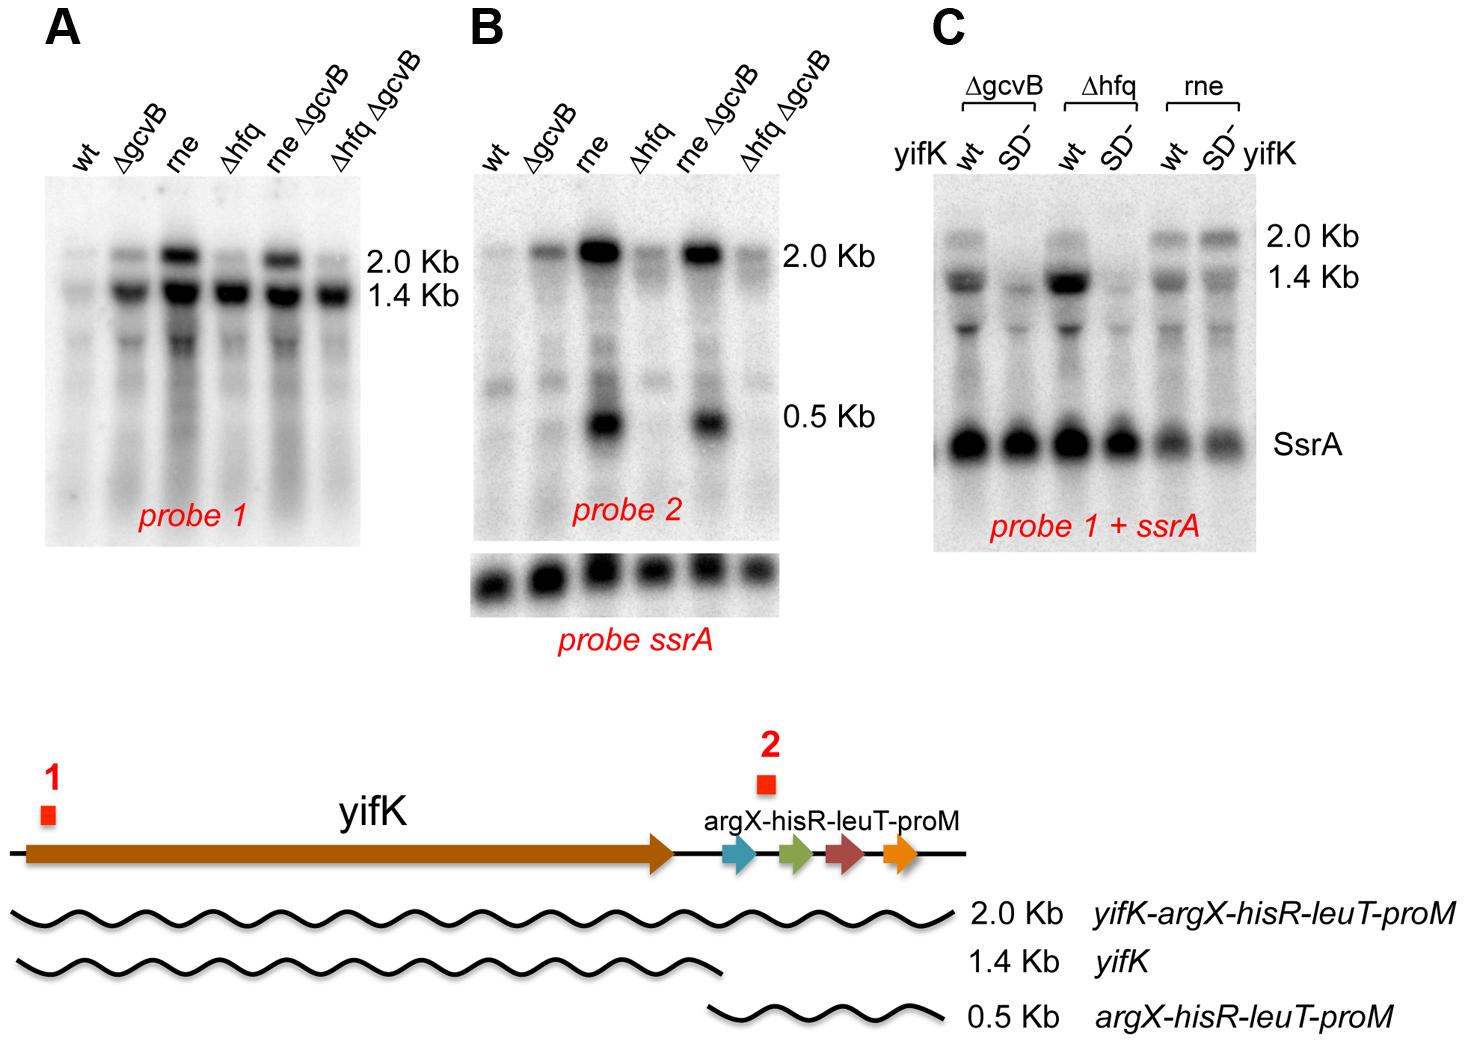 Northern blot analysis of <i>yifK</i> transcription.